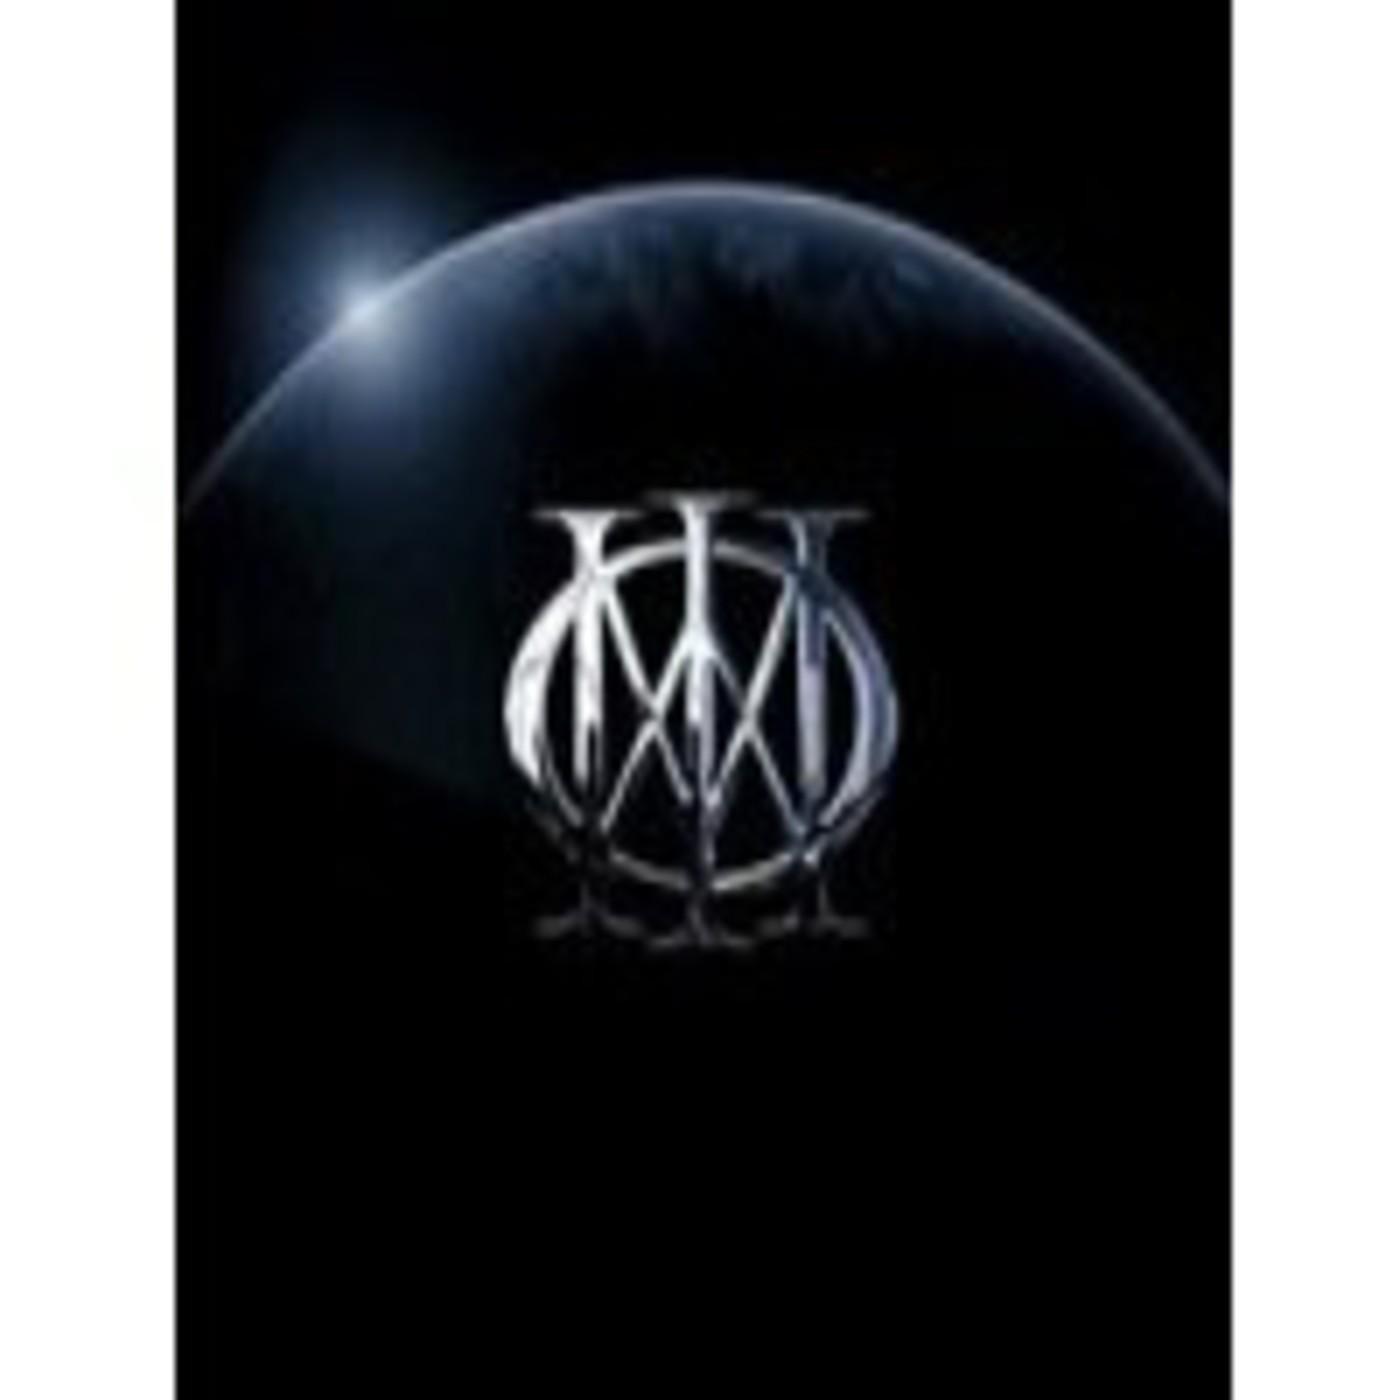 Subterranea 3x08 - Especial Dream Theater (Parte 1)